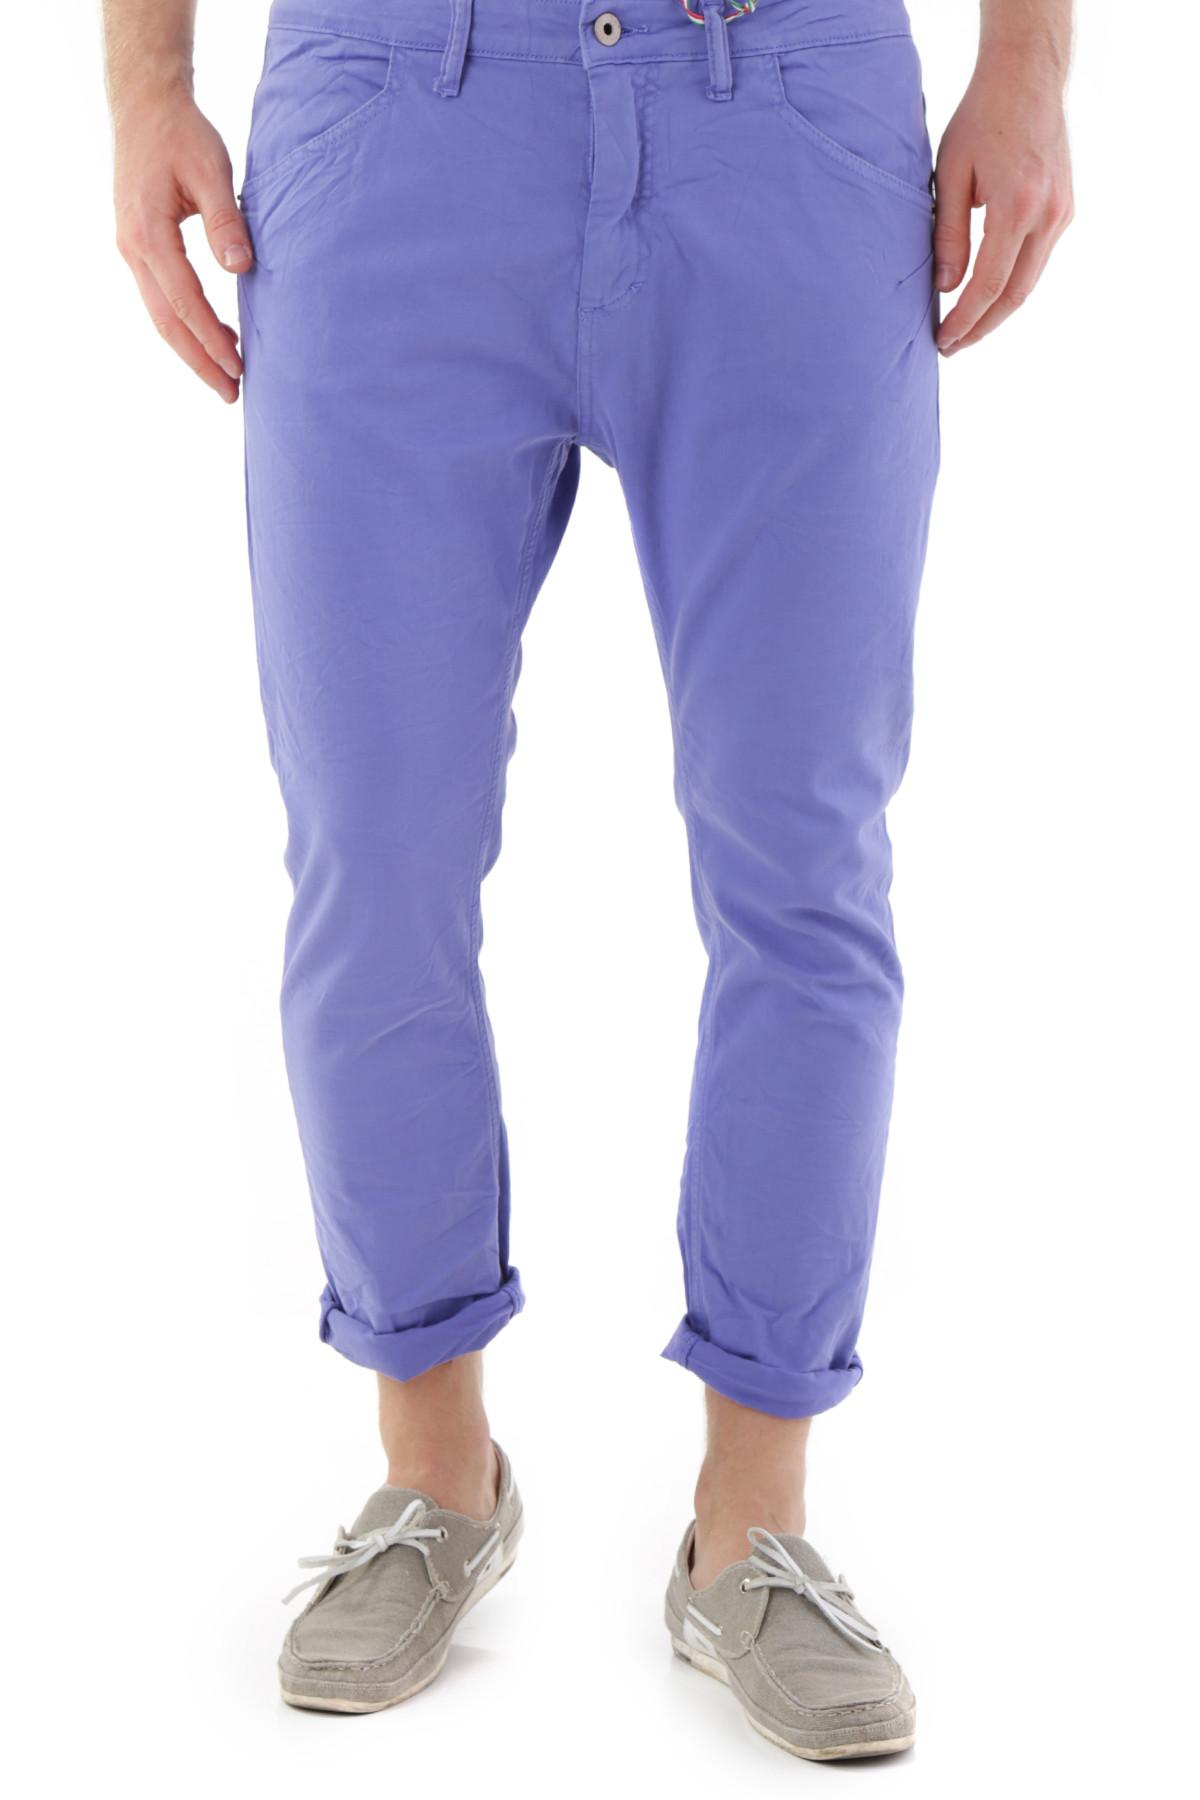 525Marchio: 525; Genere: Uomo; Tipologia: Pantaloni;…